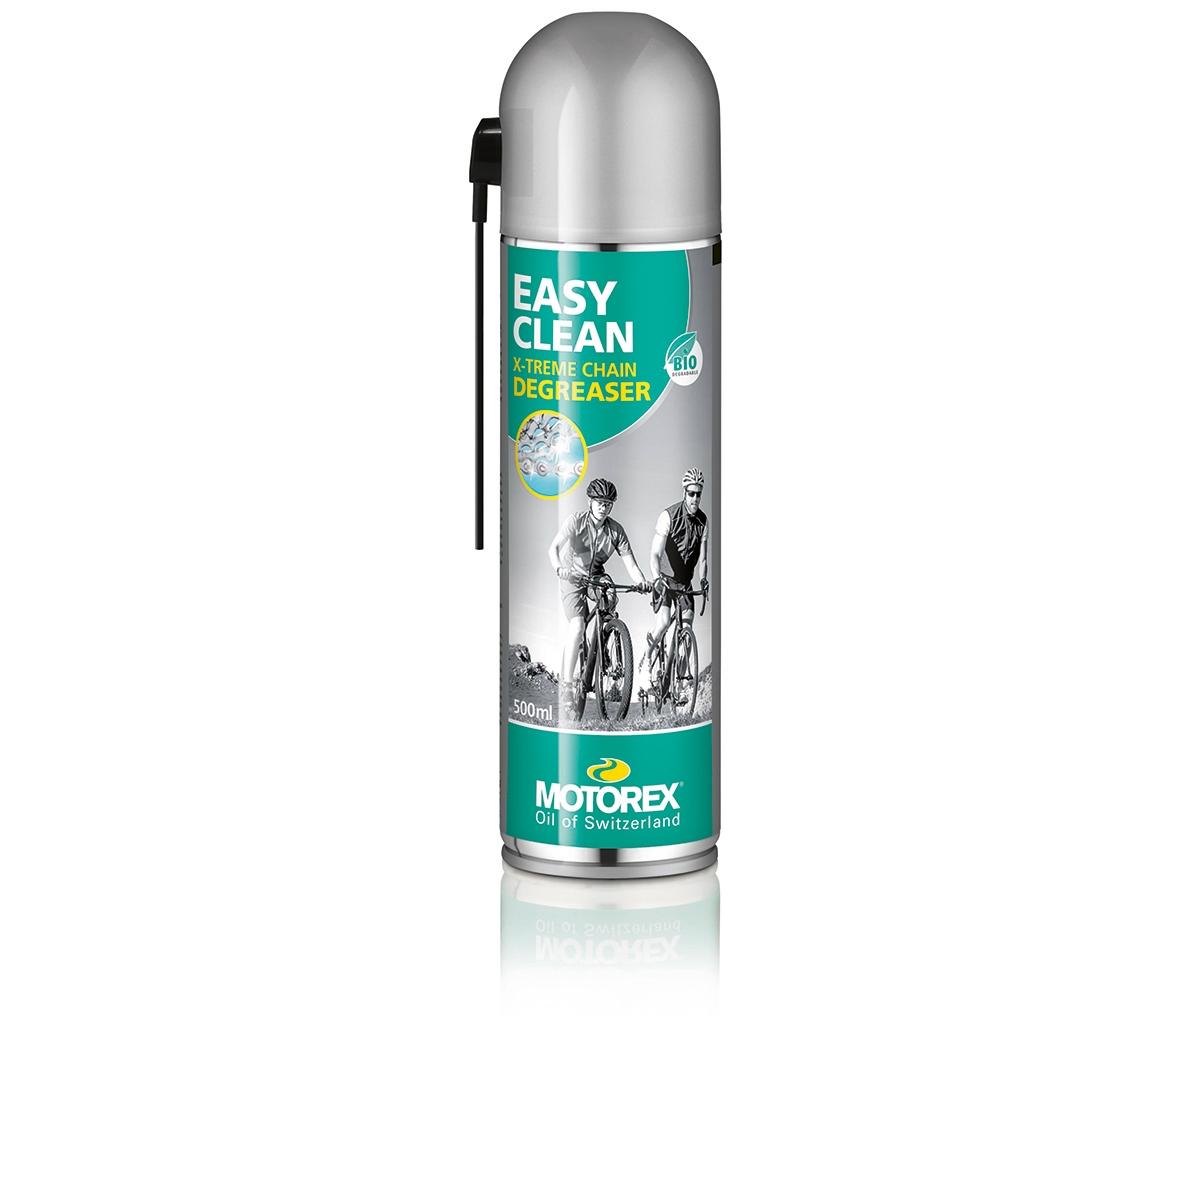 Chain Degreaser Easy Clean Biodegradable Aerosol 500ml